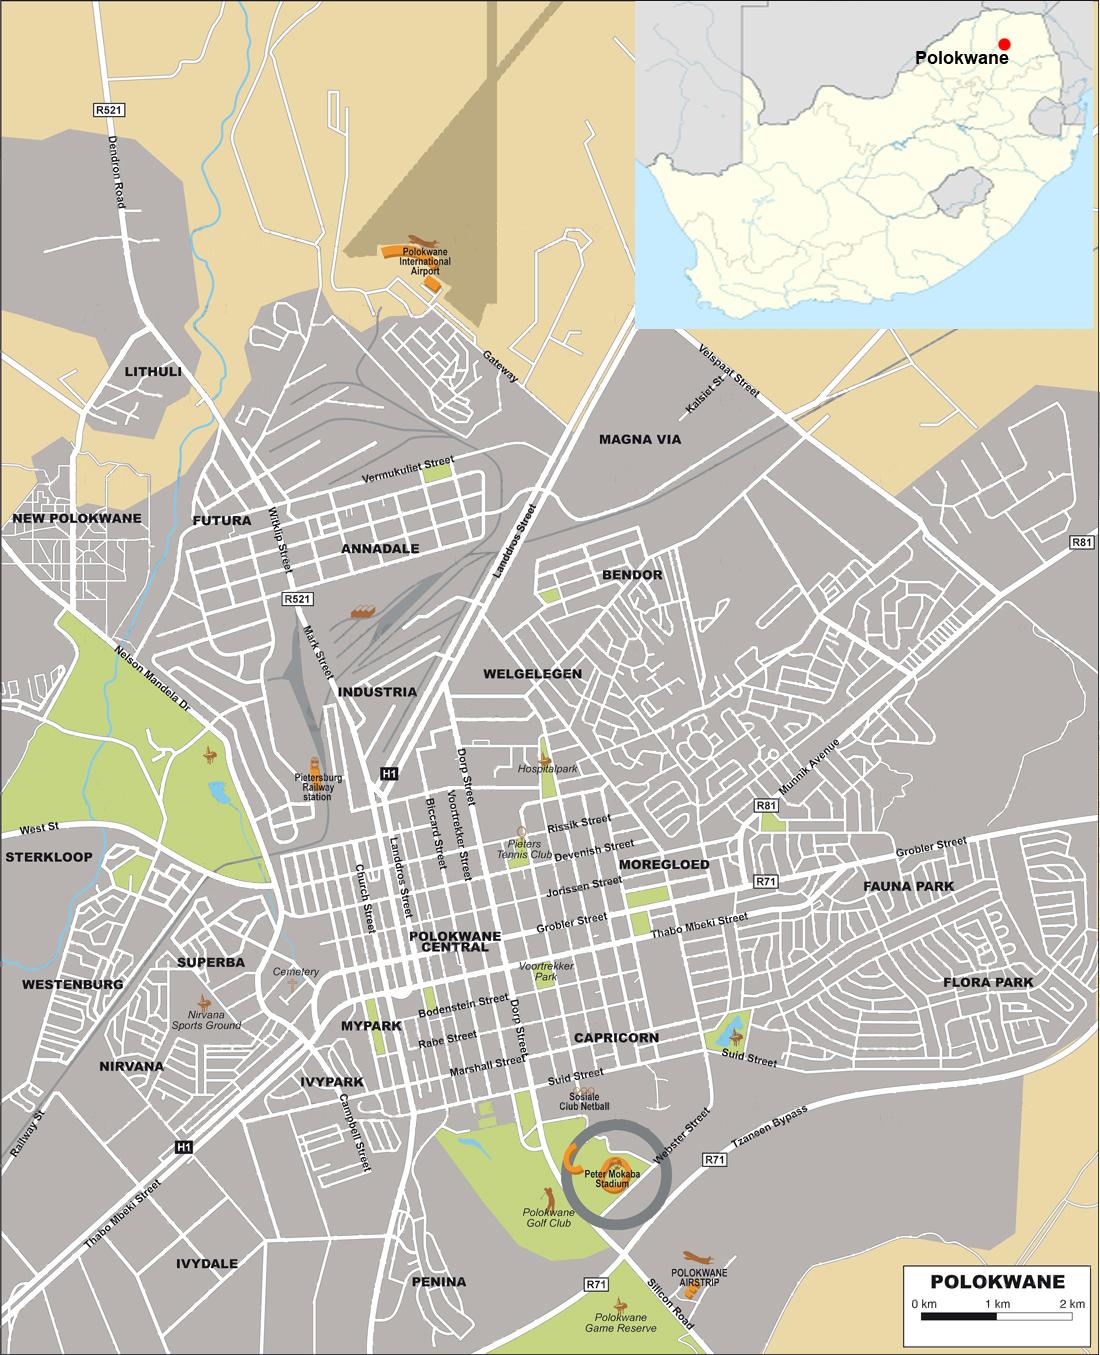 Polokwane street map